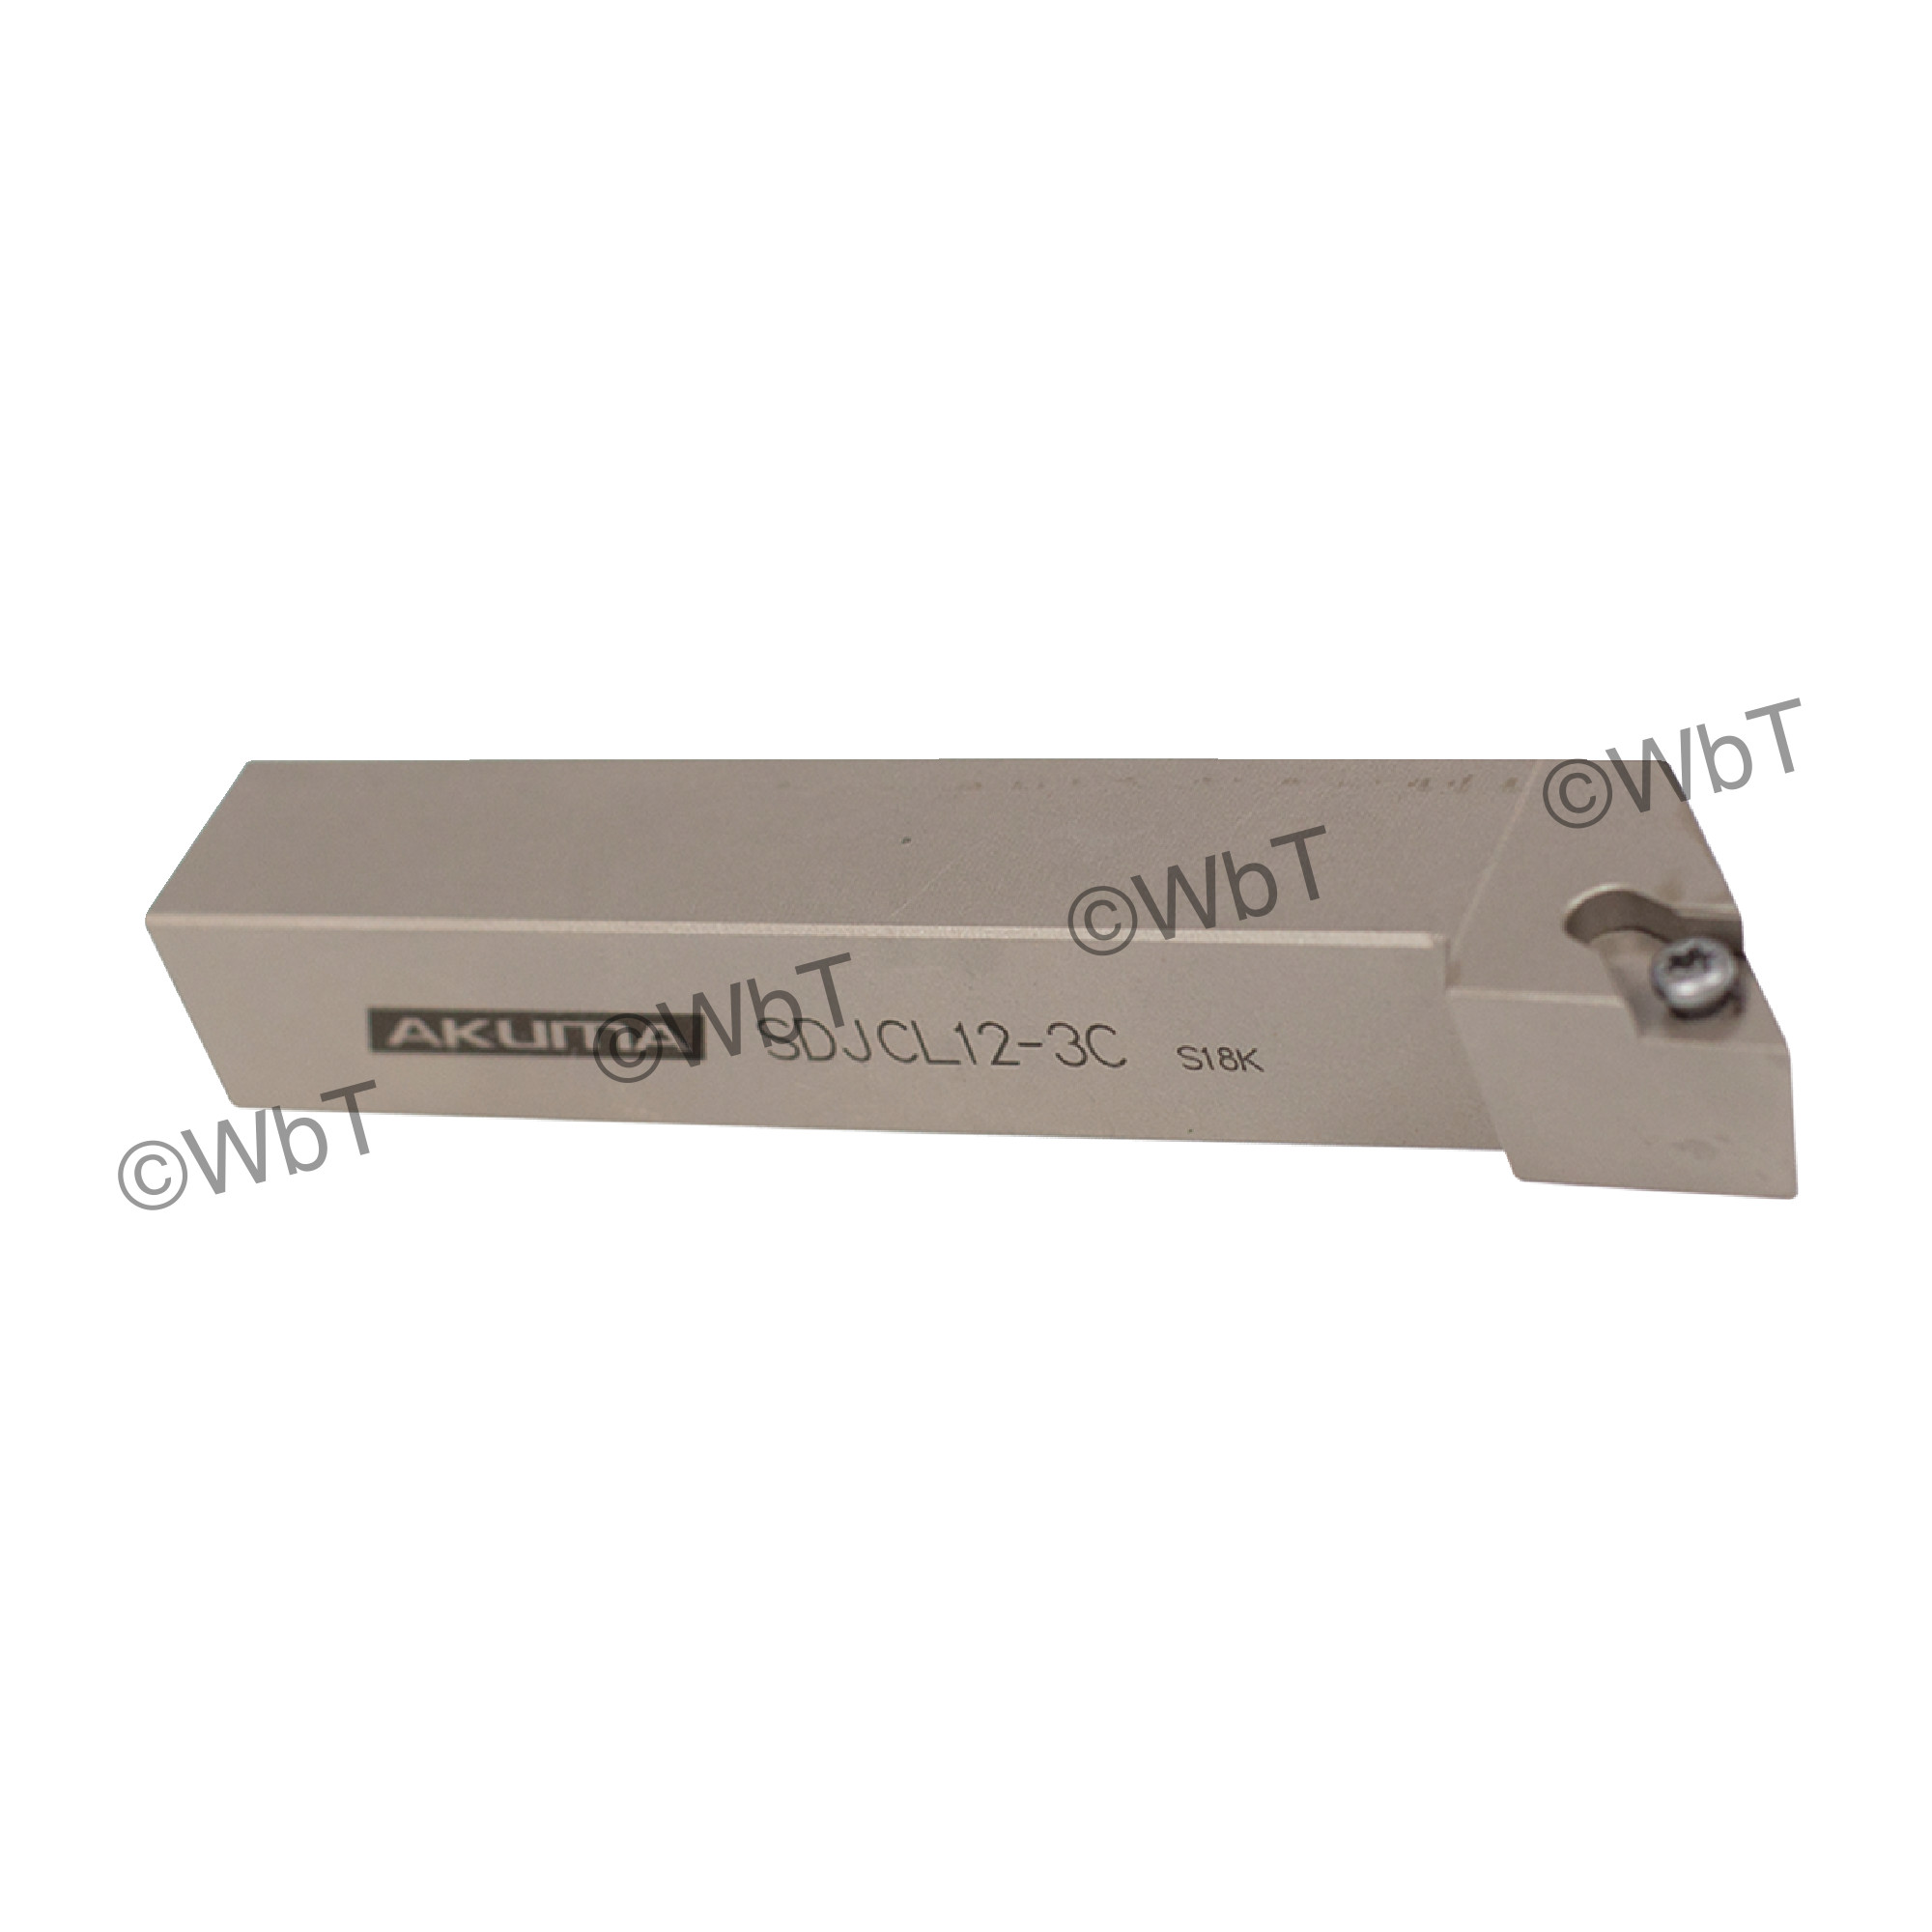 "AKUMA - SDJCL12-3C / 3/4"" Shank Holder for DCMT3(2.5)_ / Left Hand"